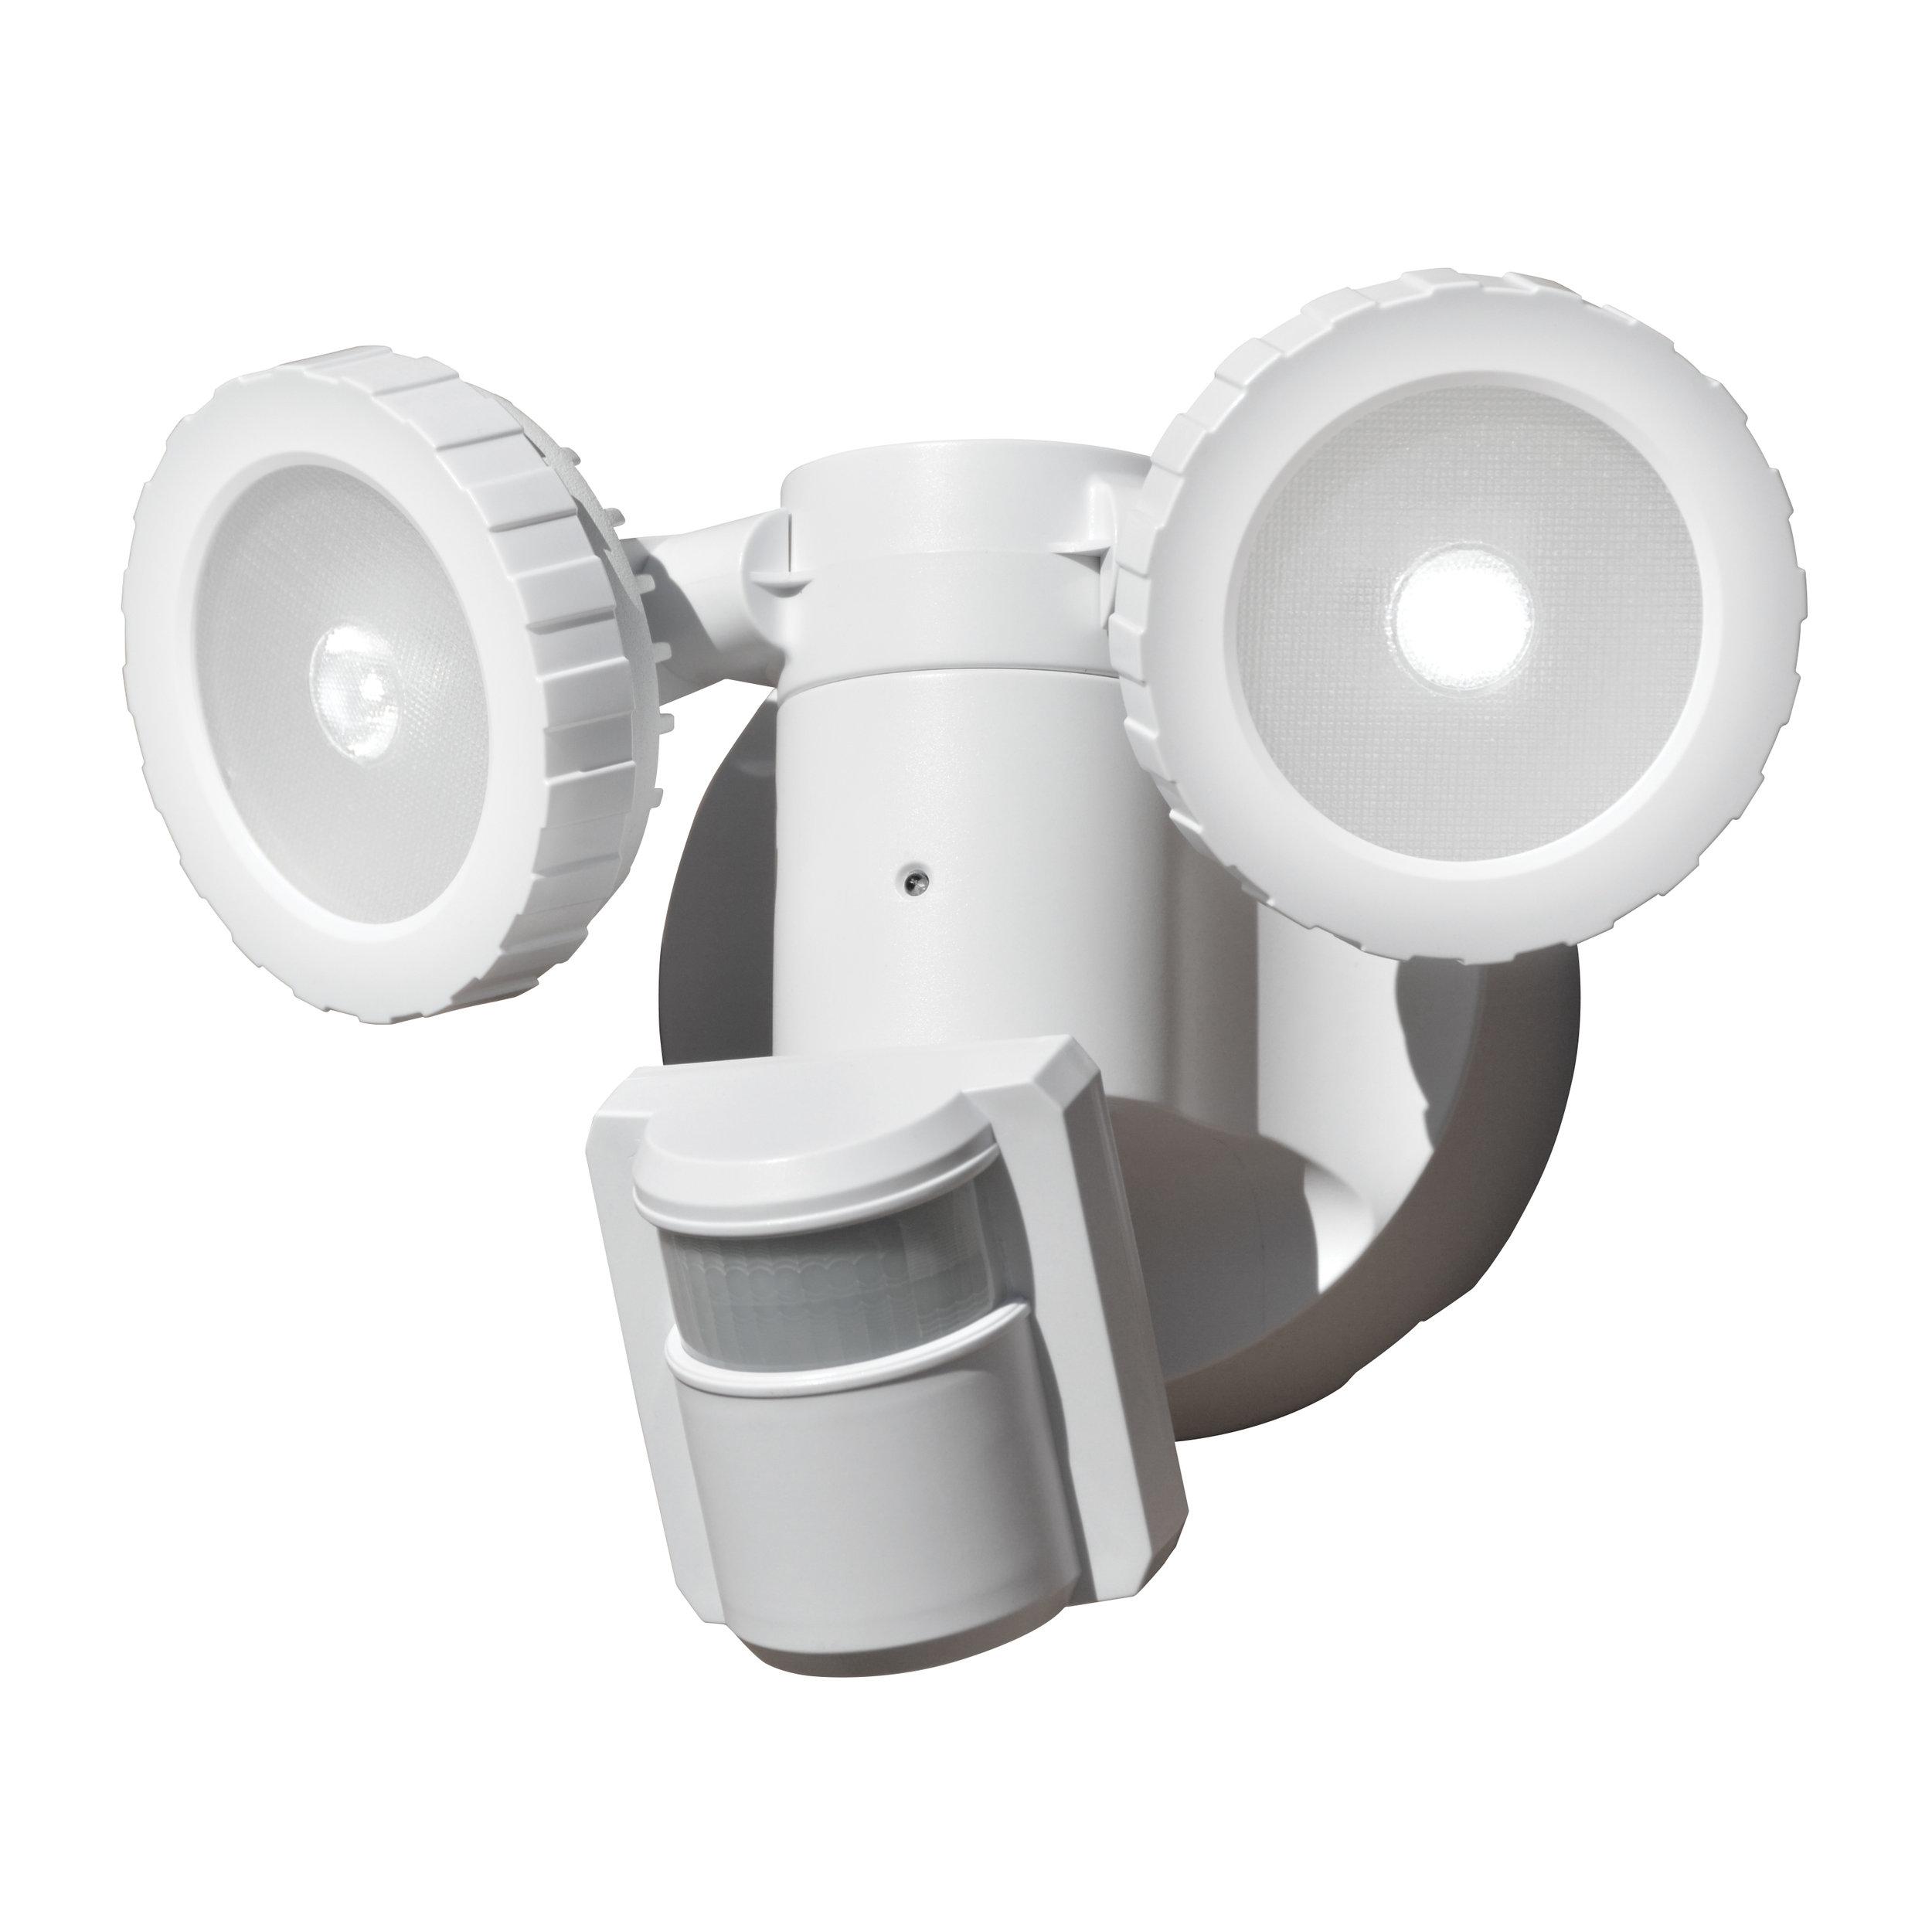 NL-DSBT Solar Security Light - Main View